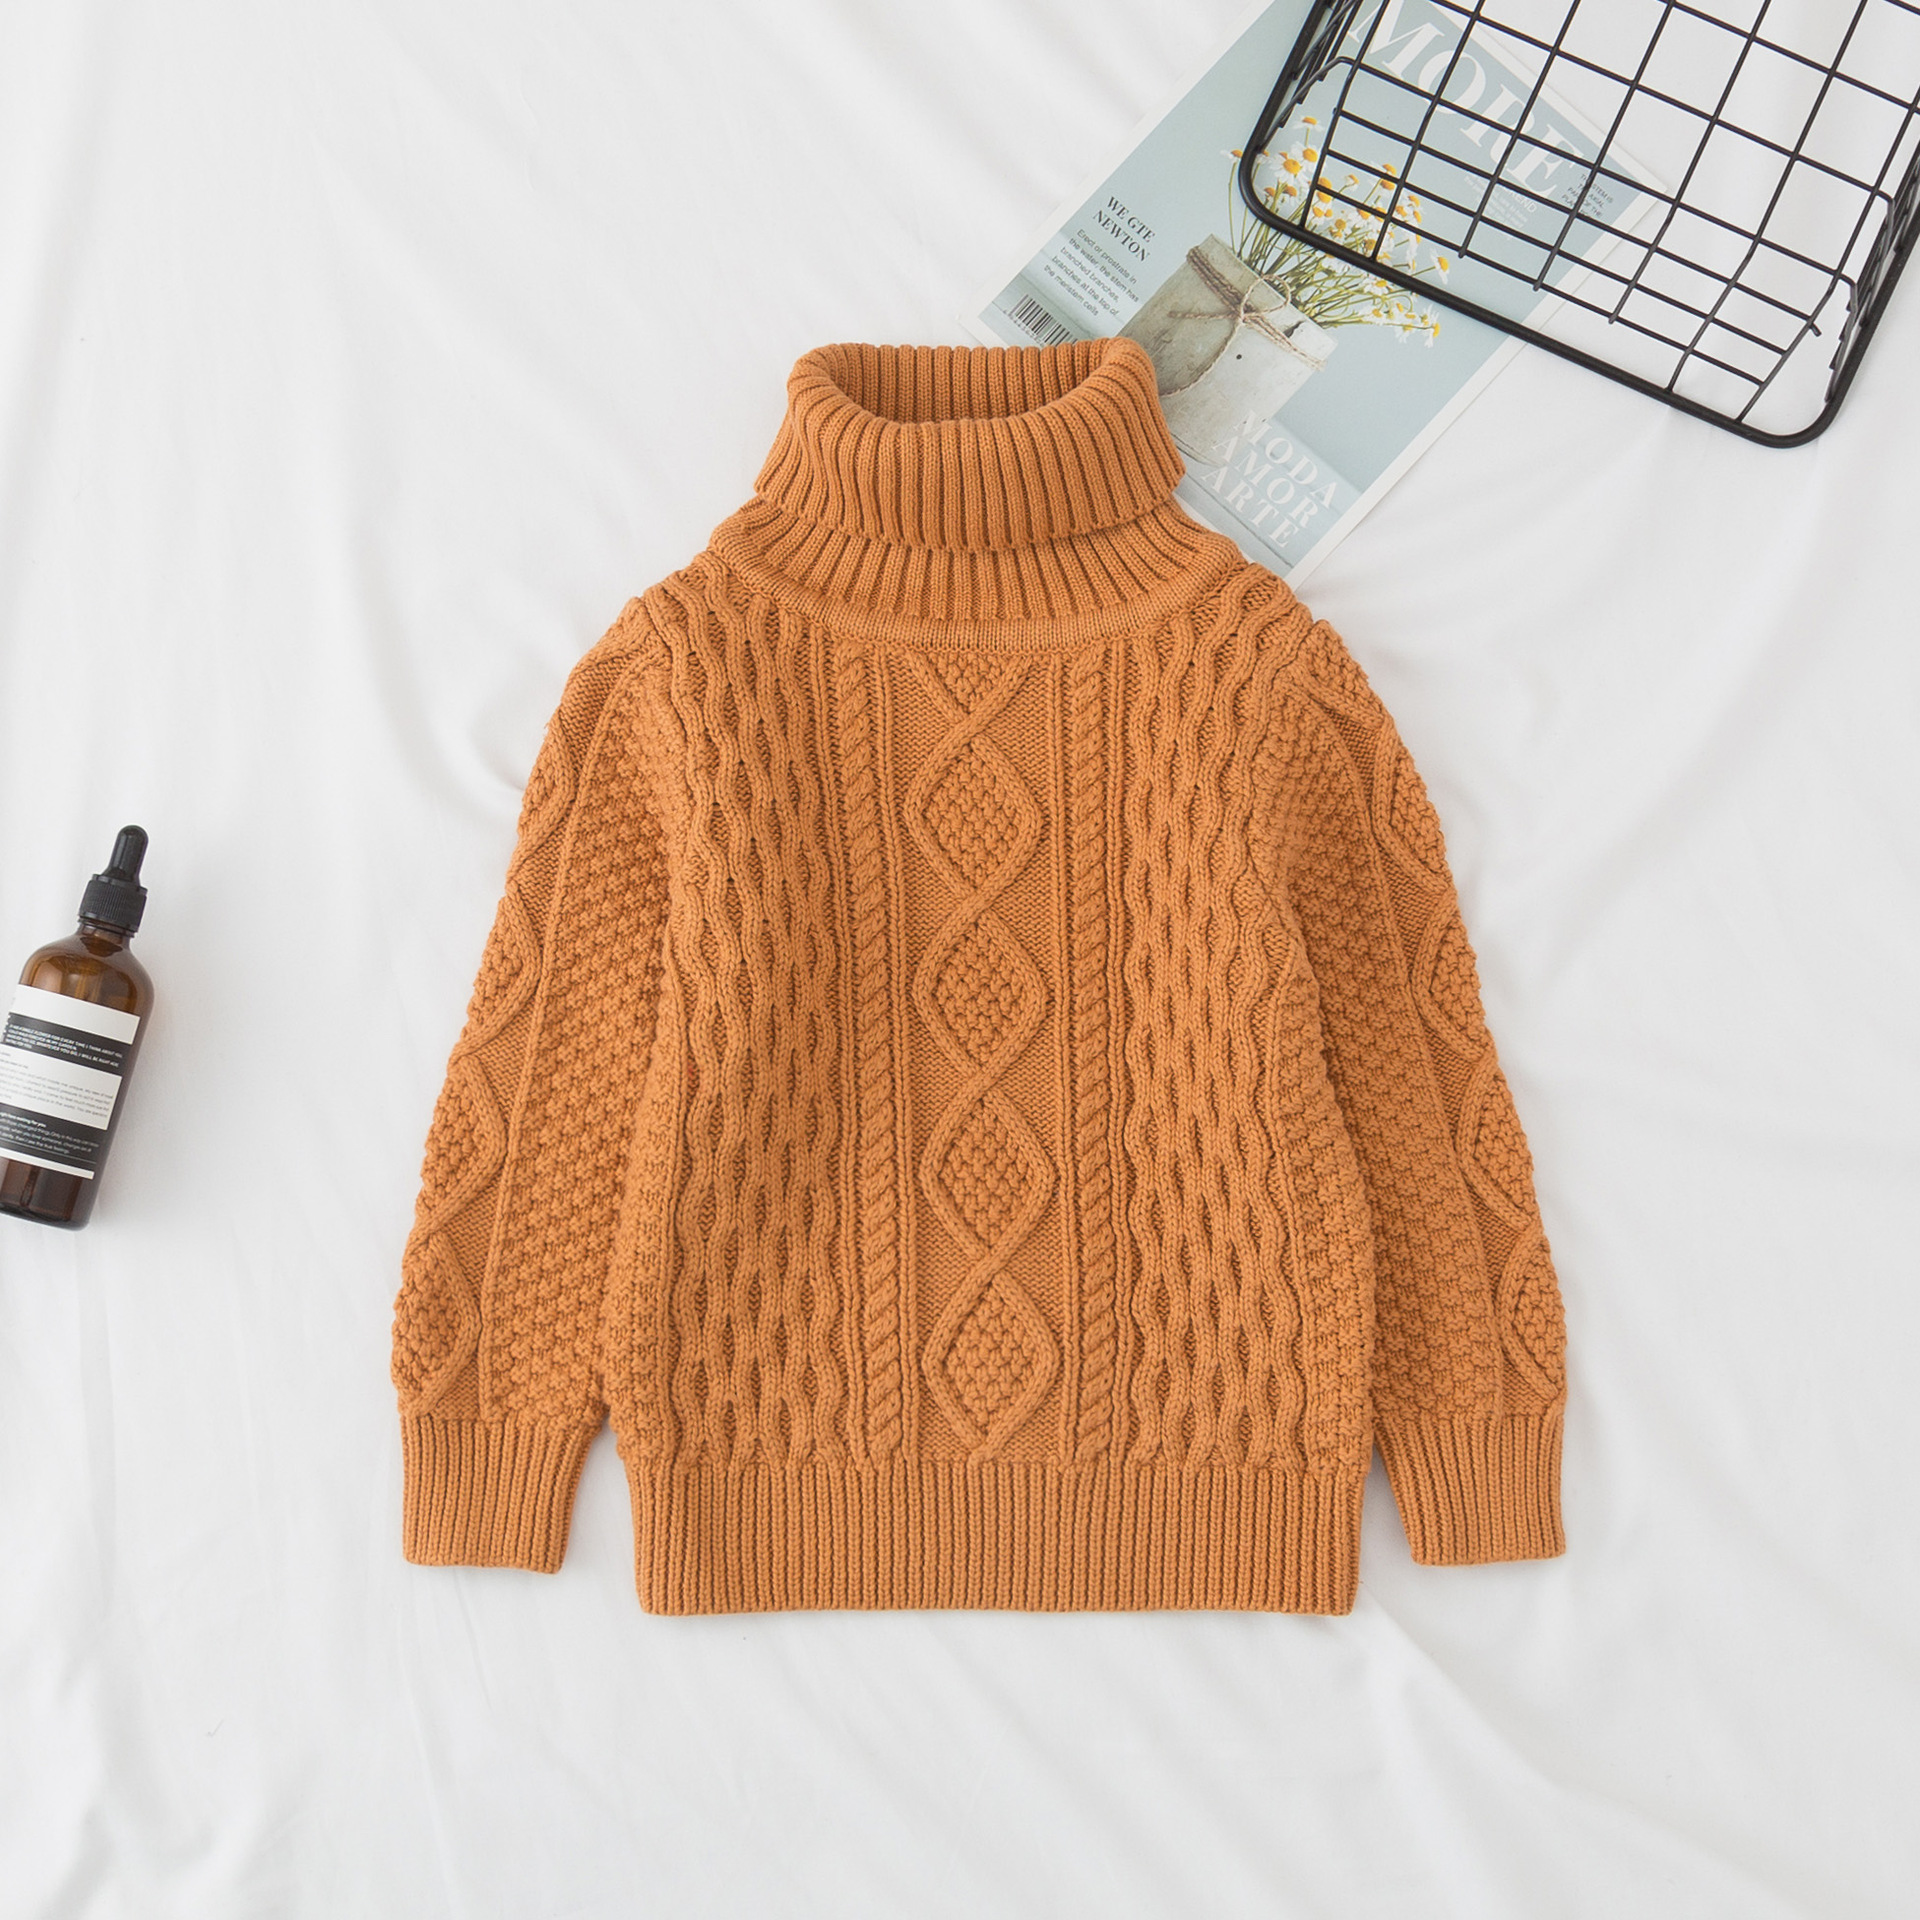 100/% Cotton kids Cardigan Boys Girls Children/'s Knit Cardigan 3 colors 1-7 Y